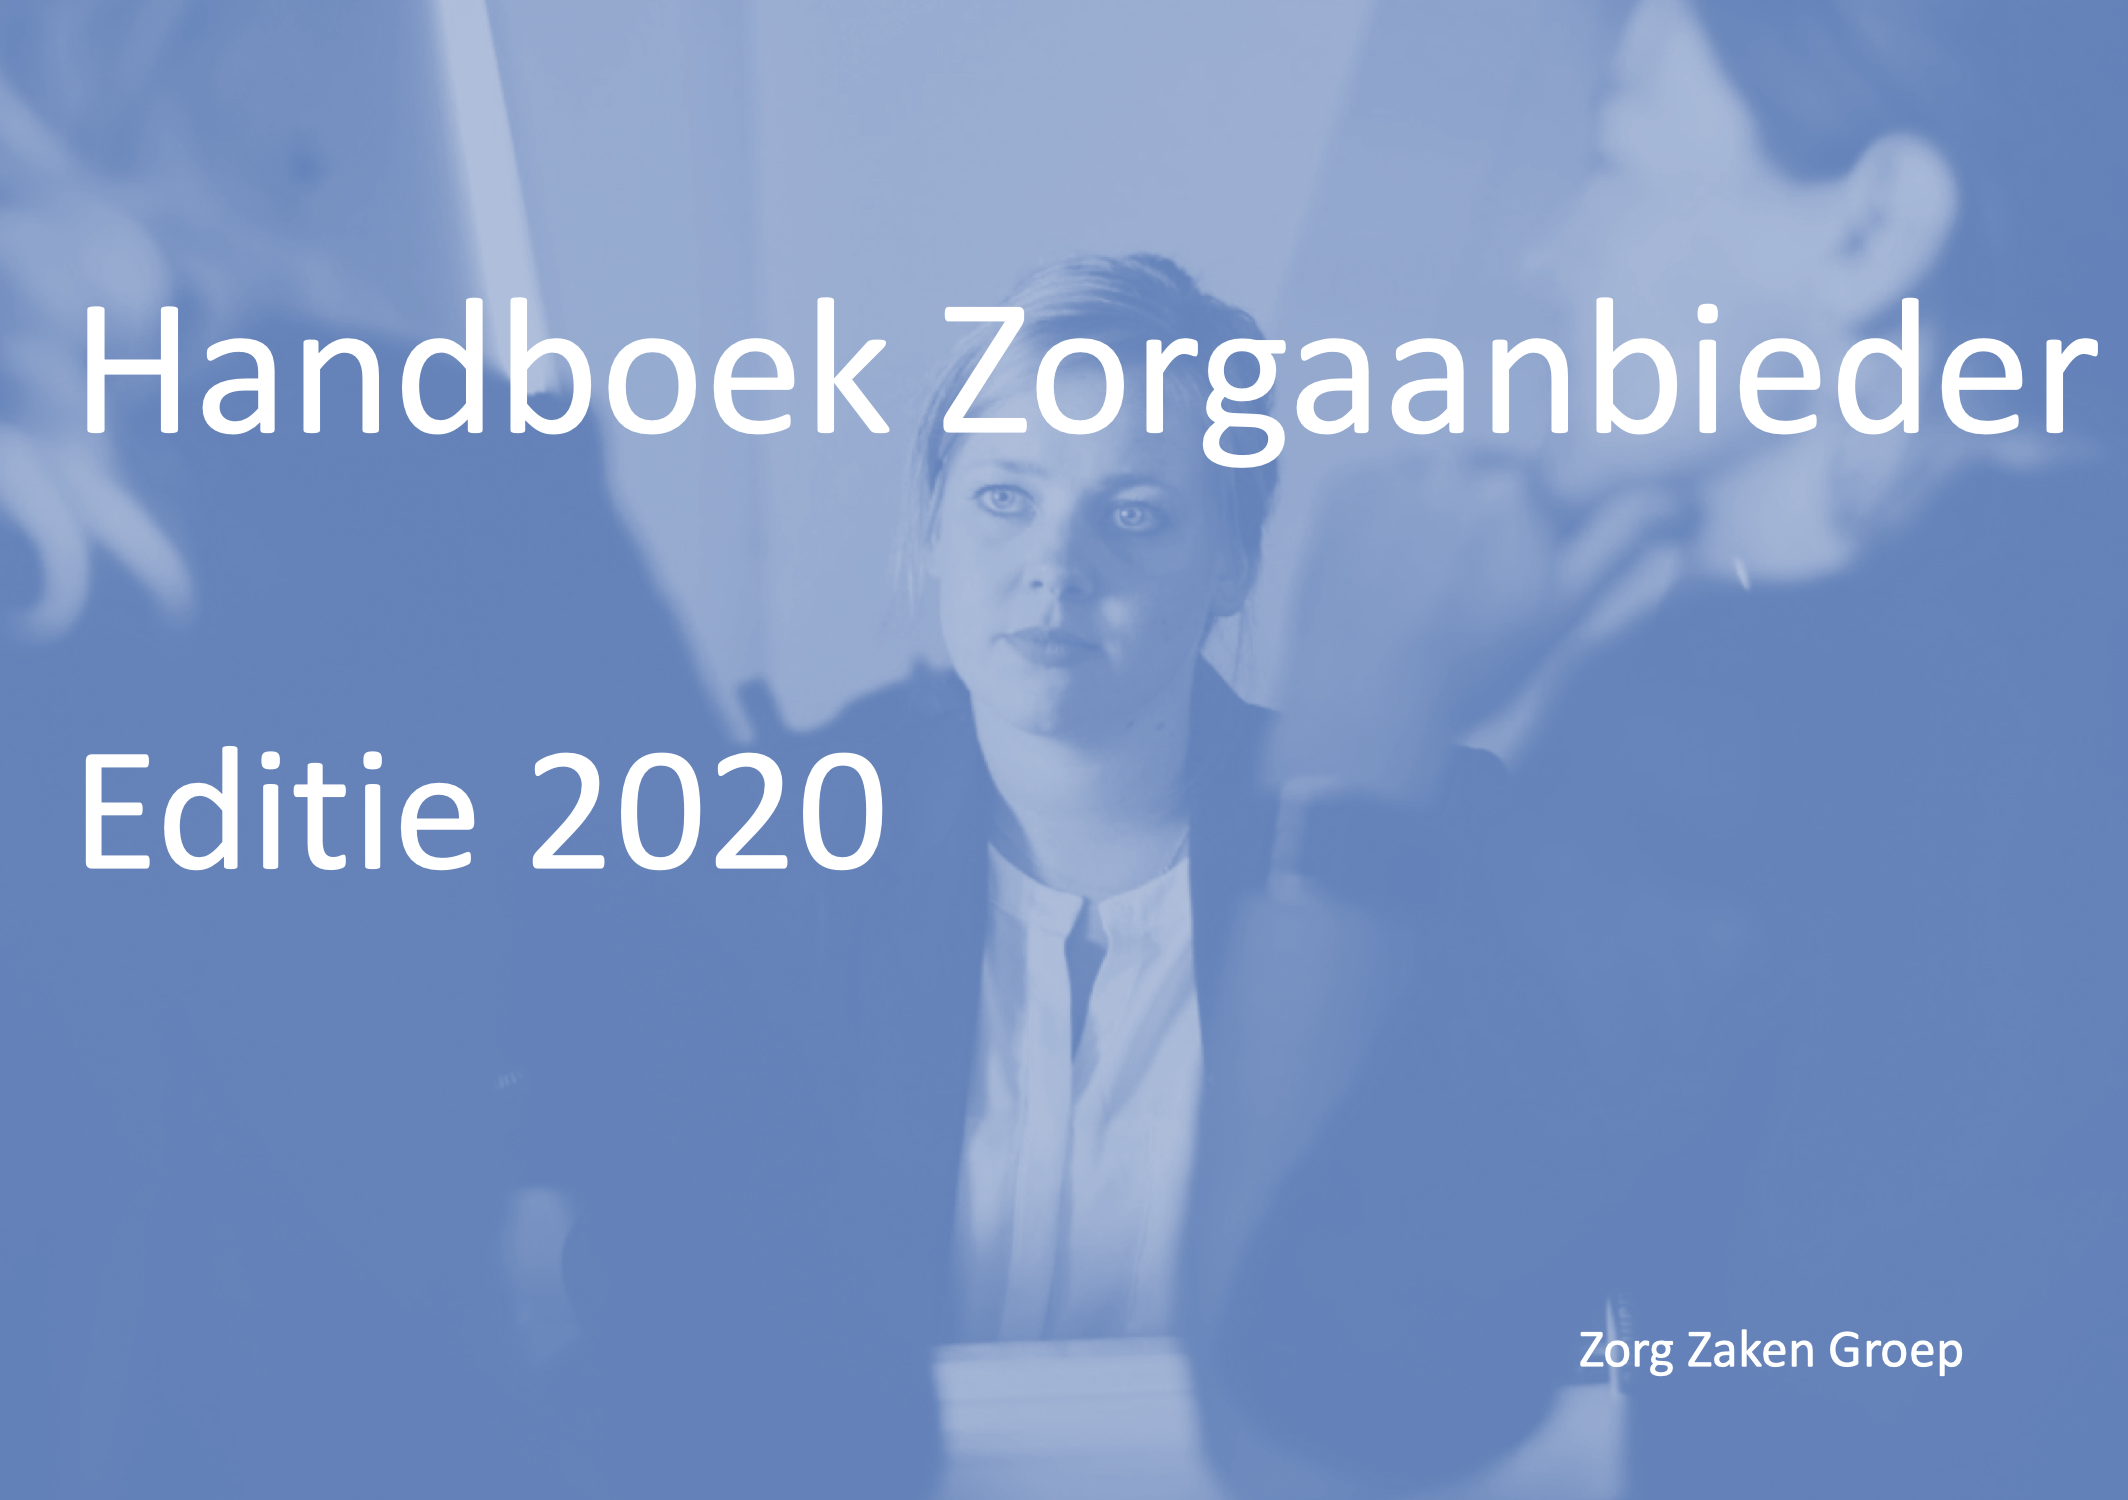 Handboek Zorgaanbieder